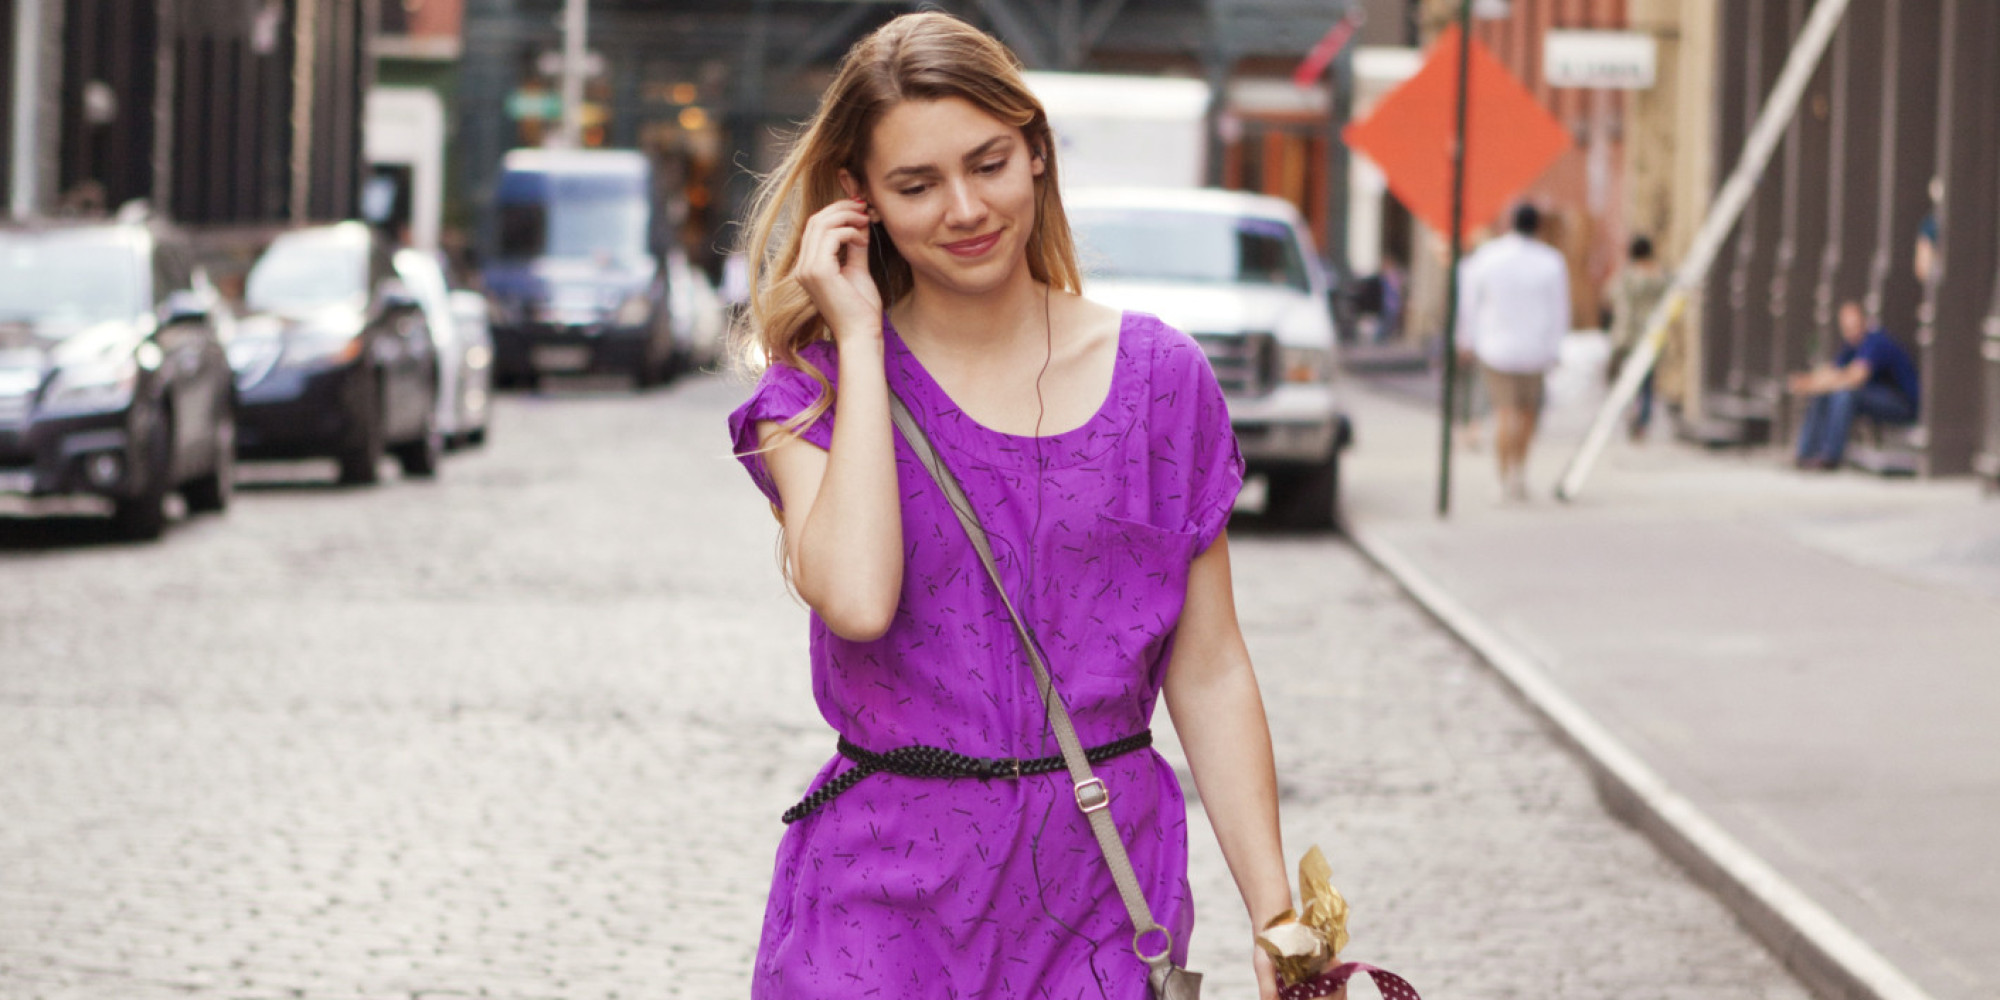 Imagini pentru woman walking